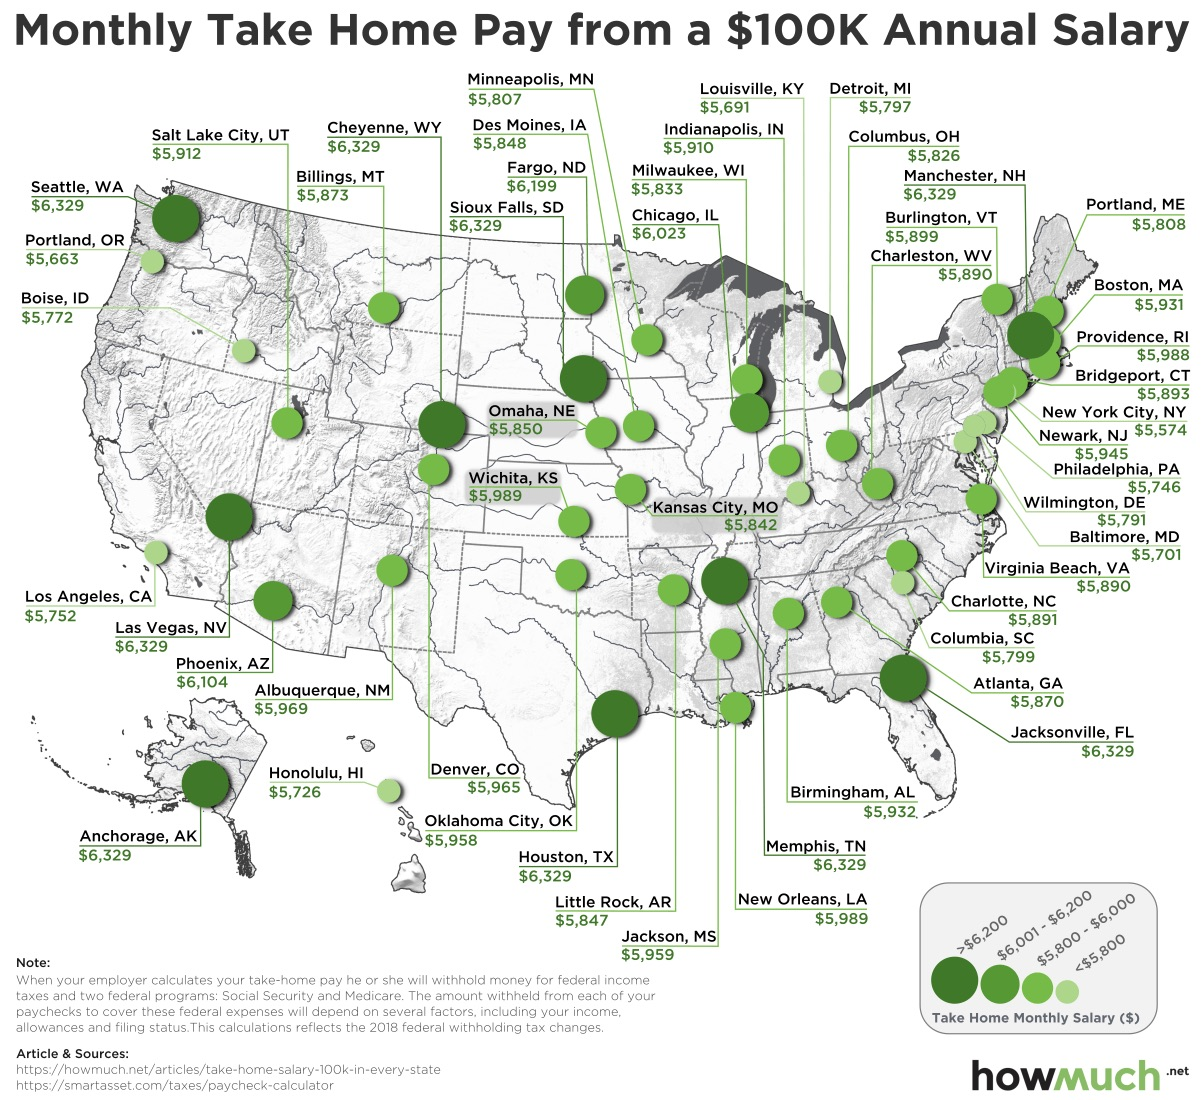 ny state paycheck calculator